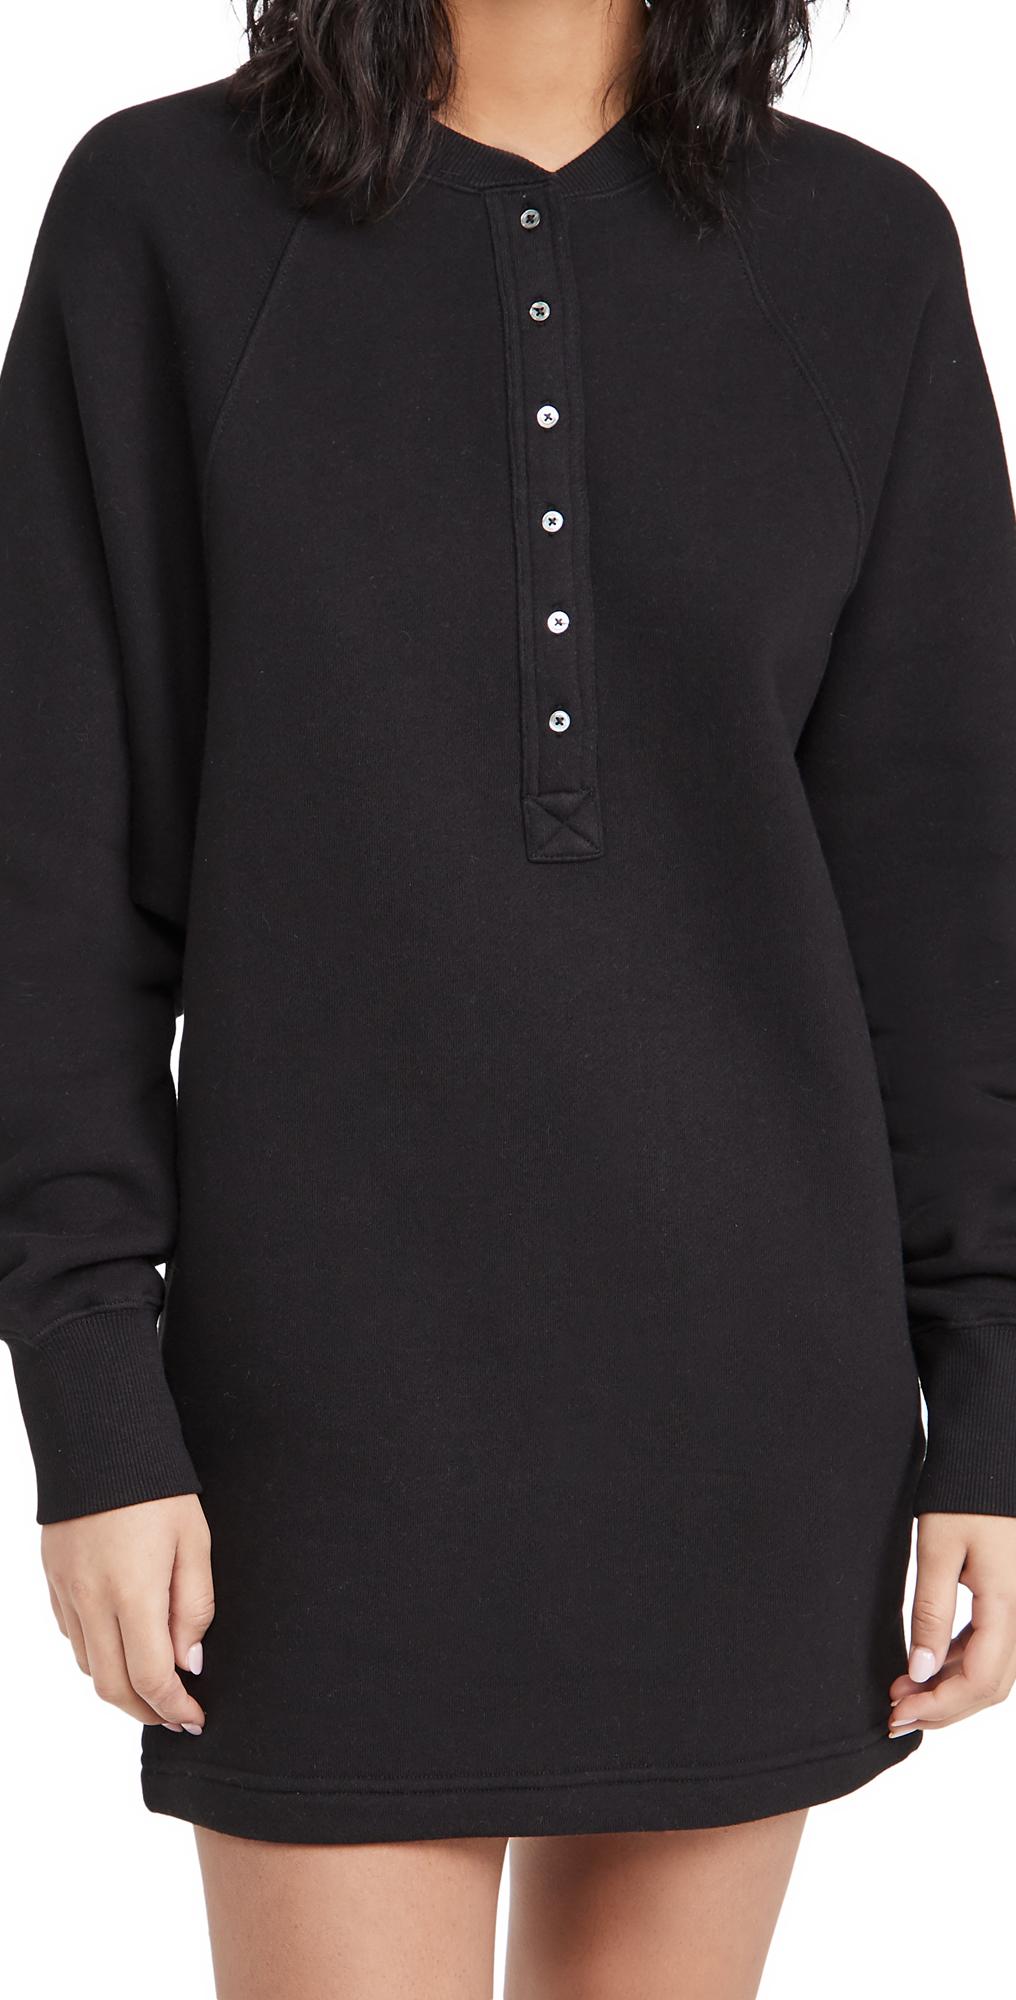 So Uptight French Terry Sweatshirt Dress